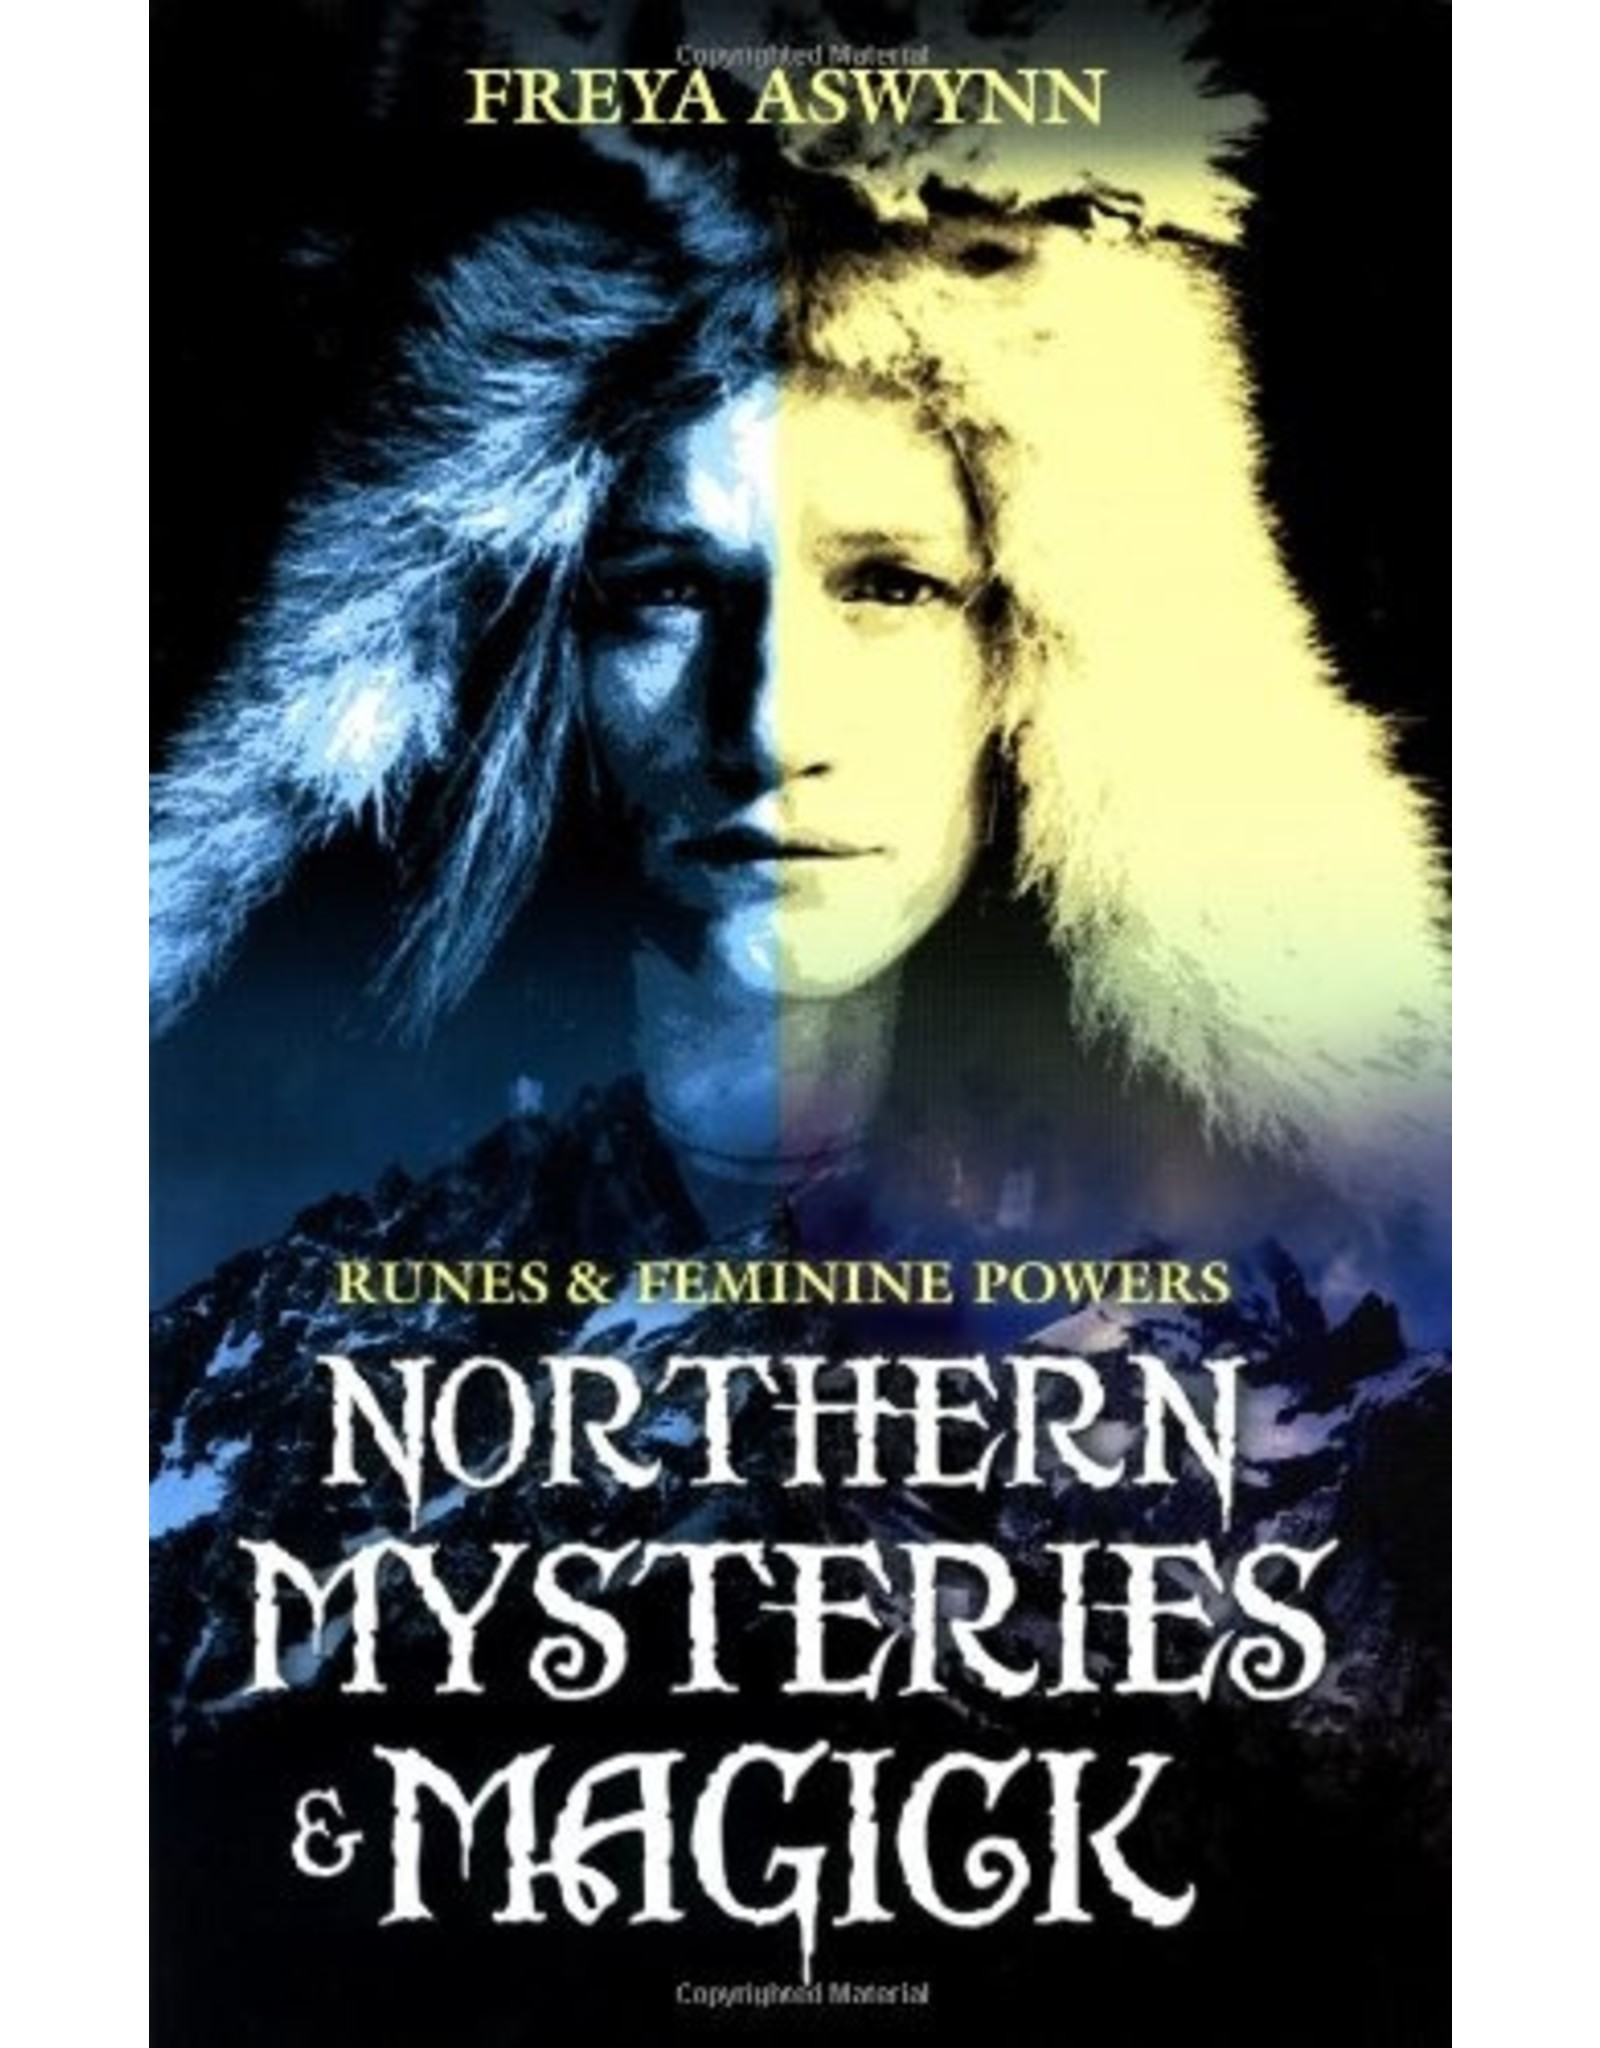 Norther Mysteries & Magick: Runes & Feminine Powers